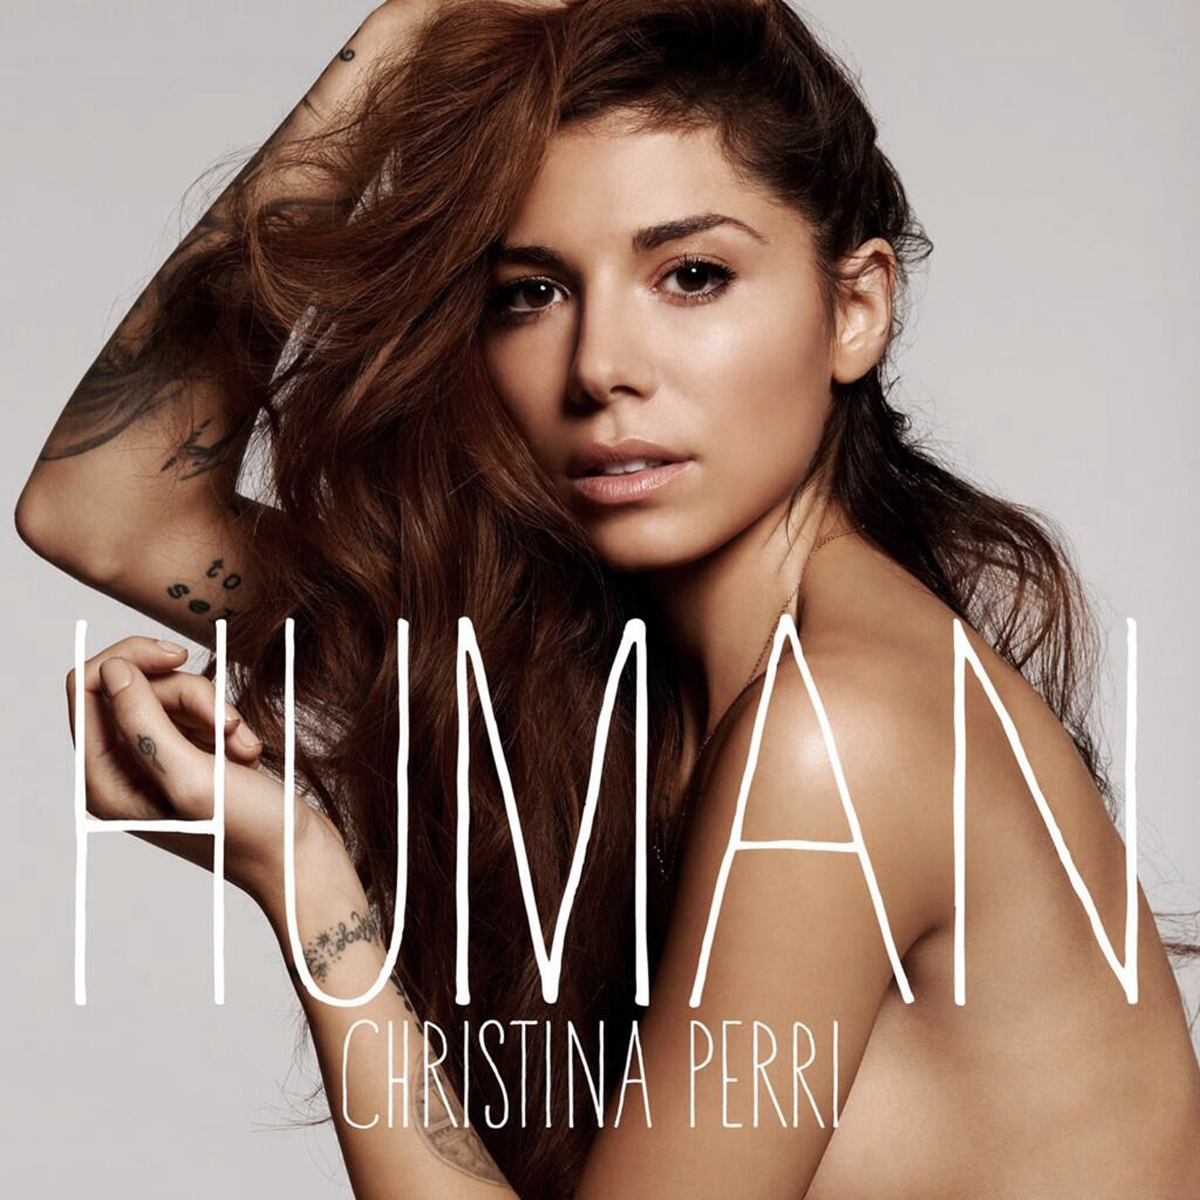 Christina-Perri-Human-2013-1200x1200.png